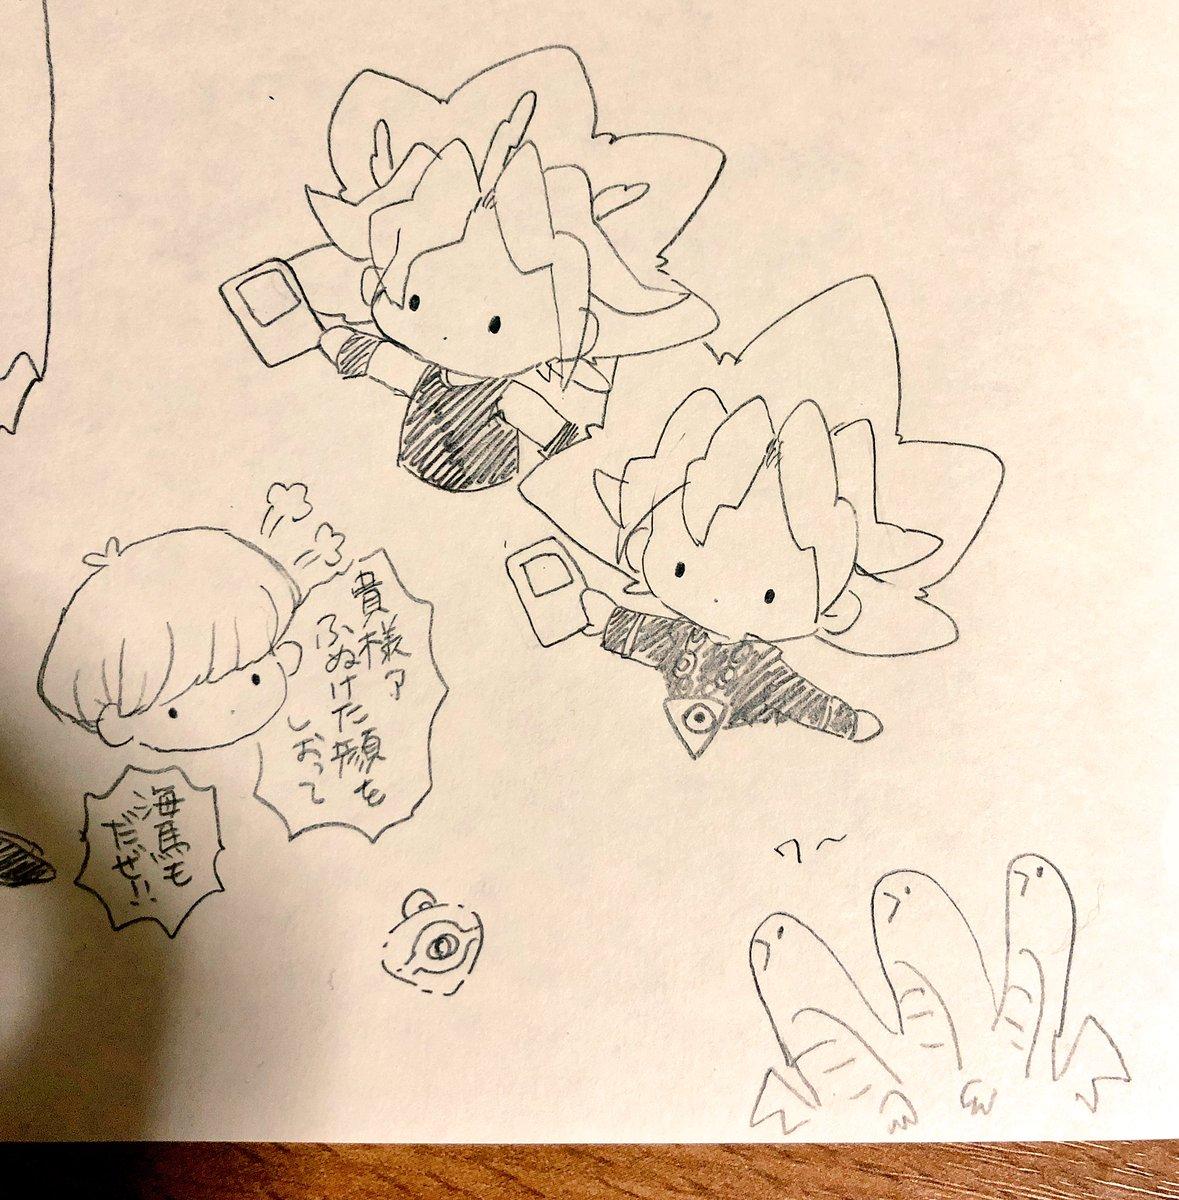 RT @ustrkym: お姉ちゃんが描いてくれた かわいい https://t.co/L5zOQUjKve